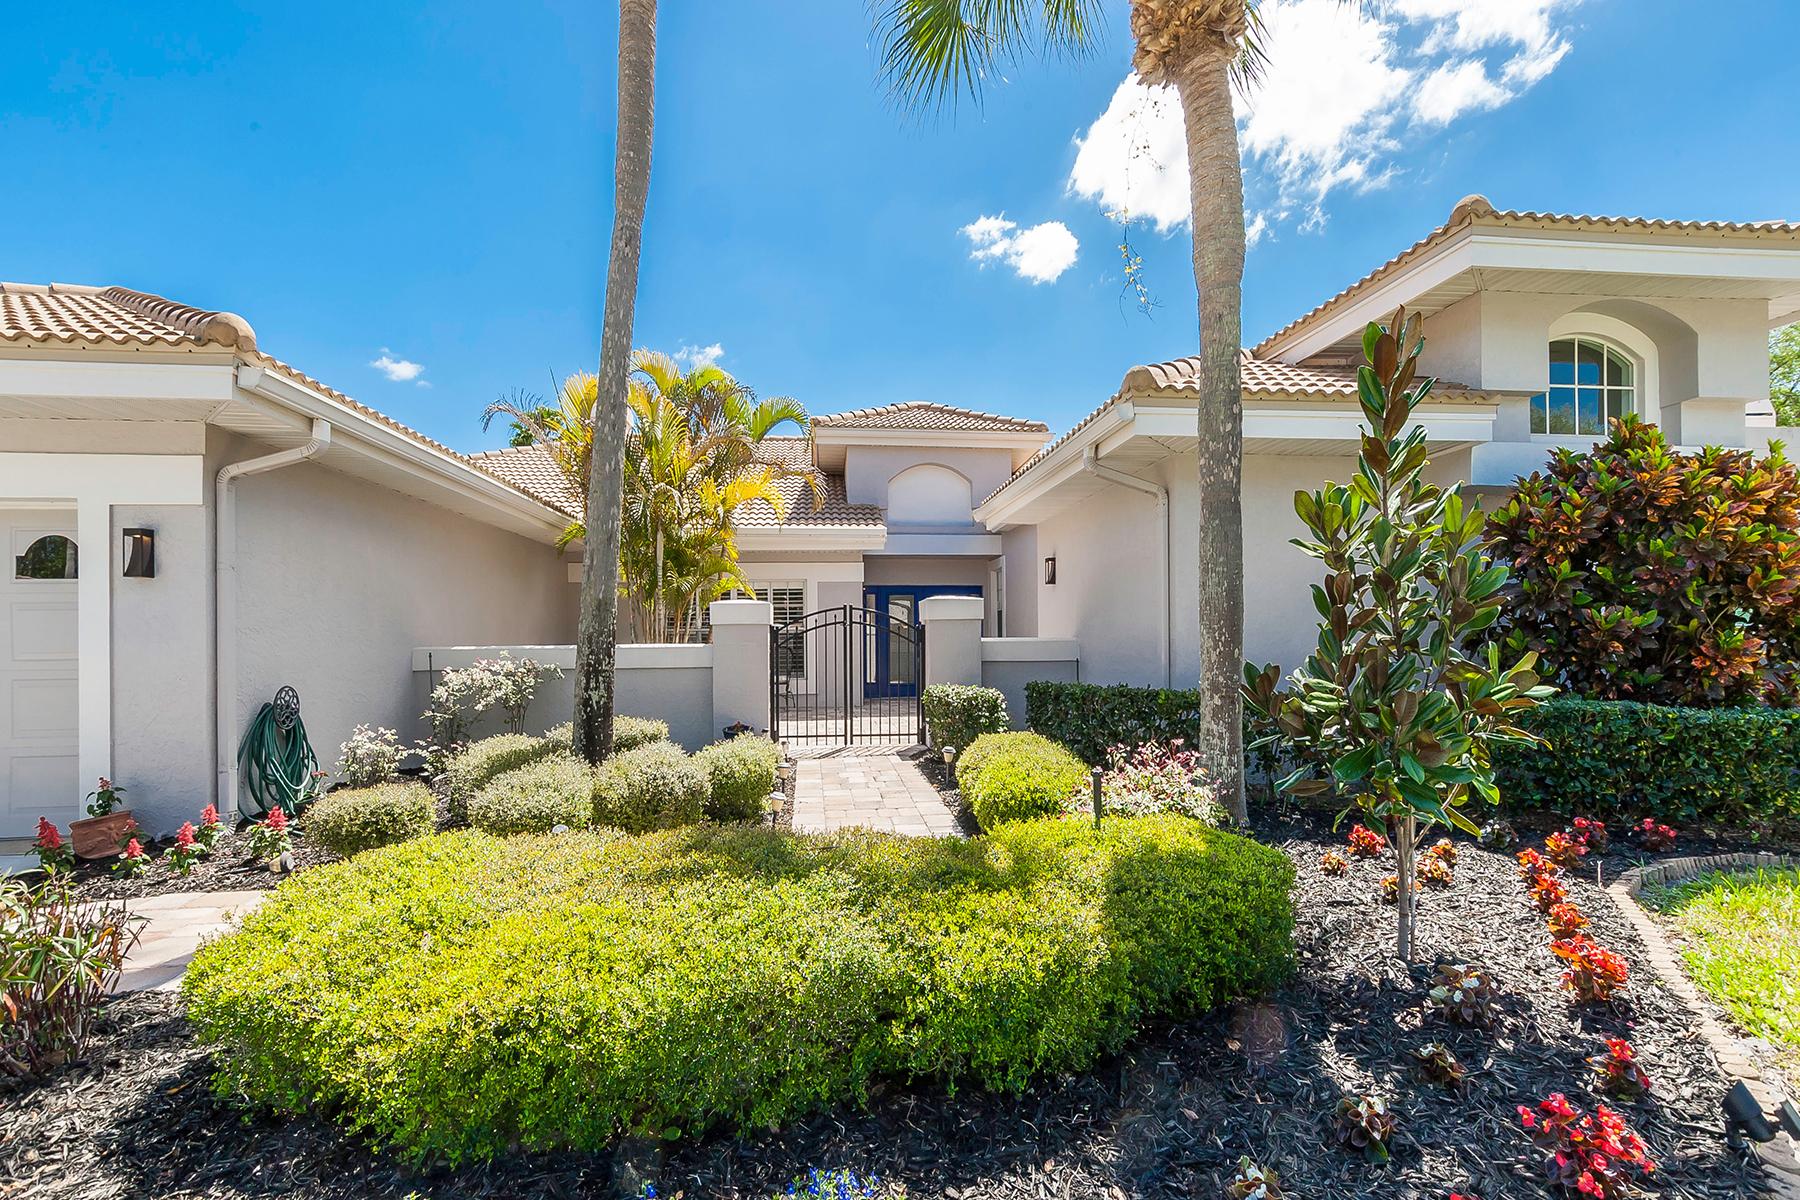 Single Family Home for Sale at THE MEADOWS 4533 Highland Oaks Cir, Sarasota, Florida 34235 United States